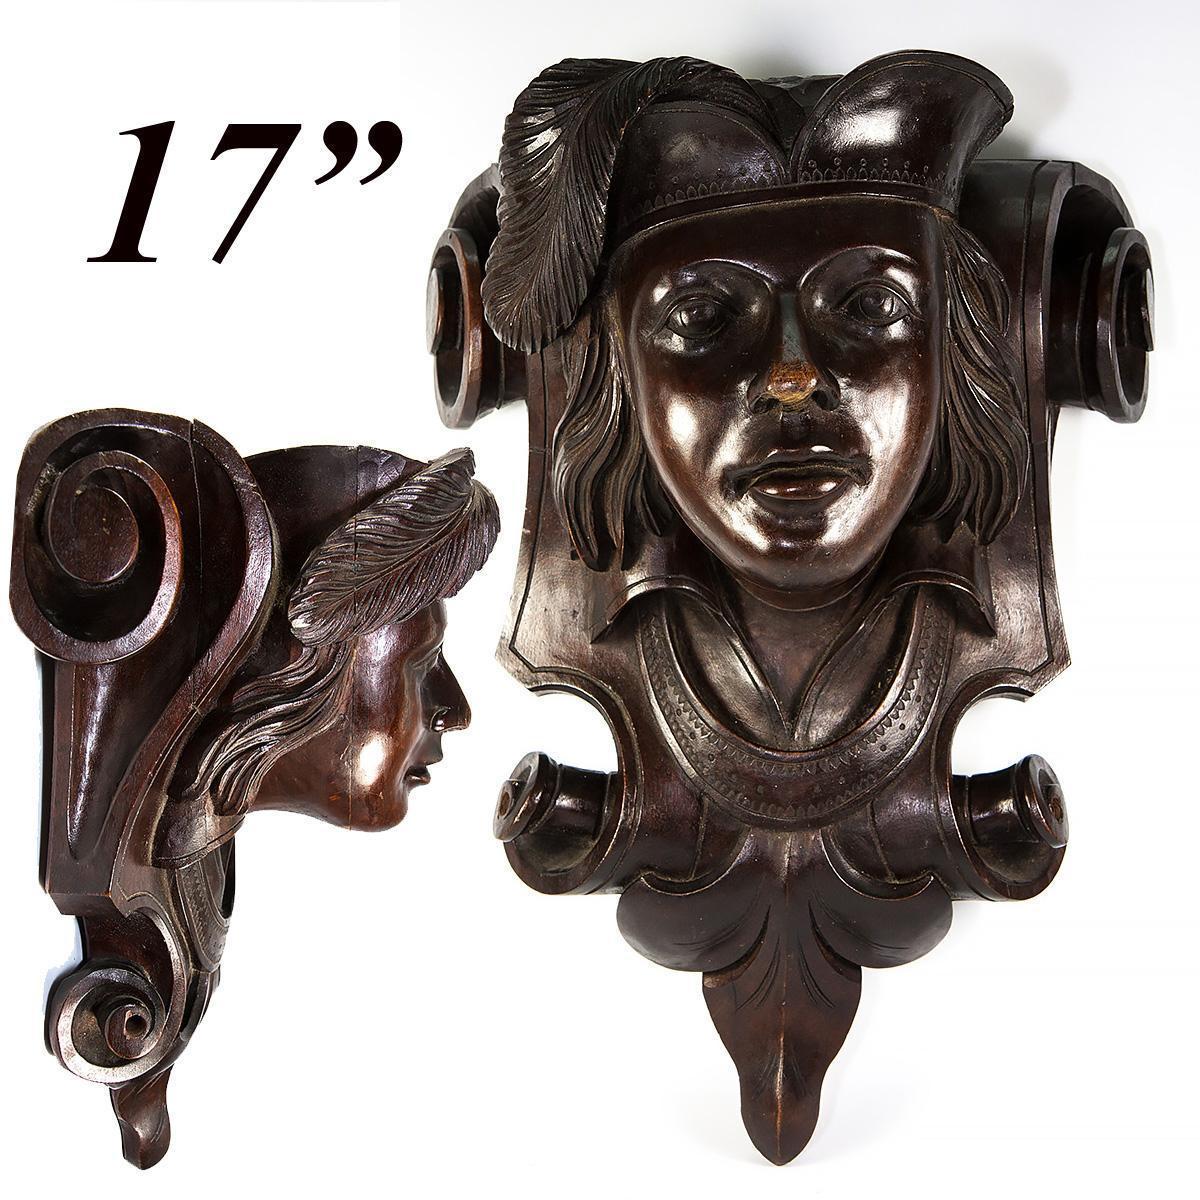 "Large 17"" Antique Carved Wood Figural Wall Shelf, Bracket Shelf Renaissance Theme, Victorian Era"